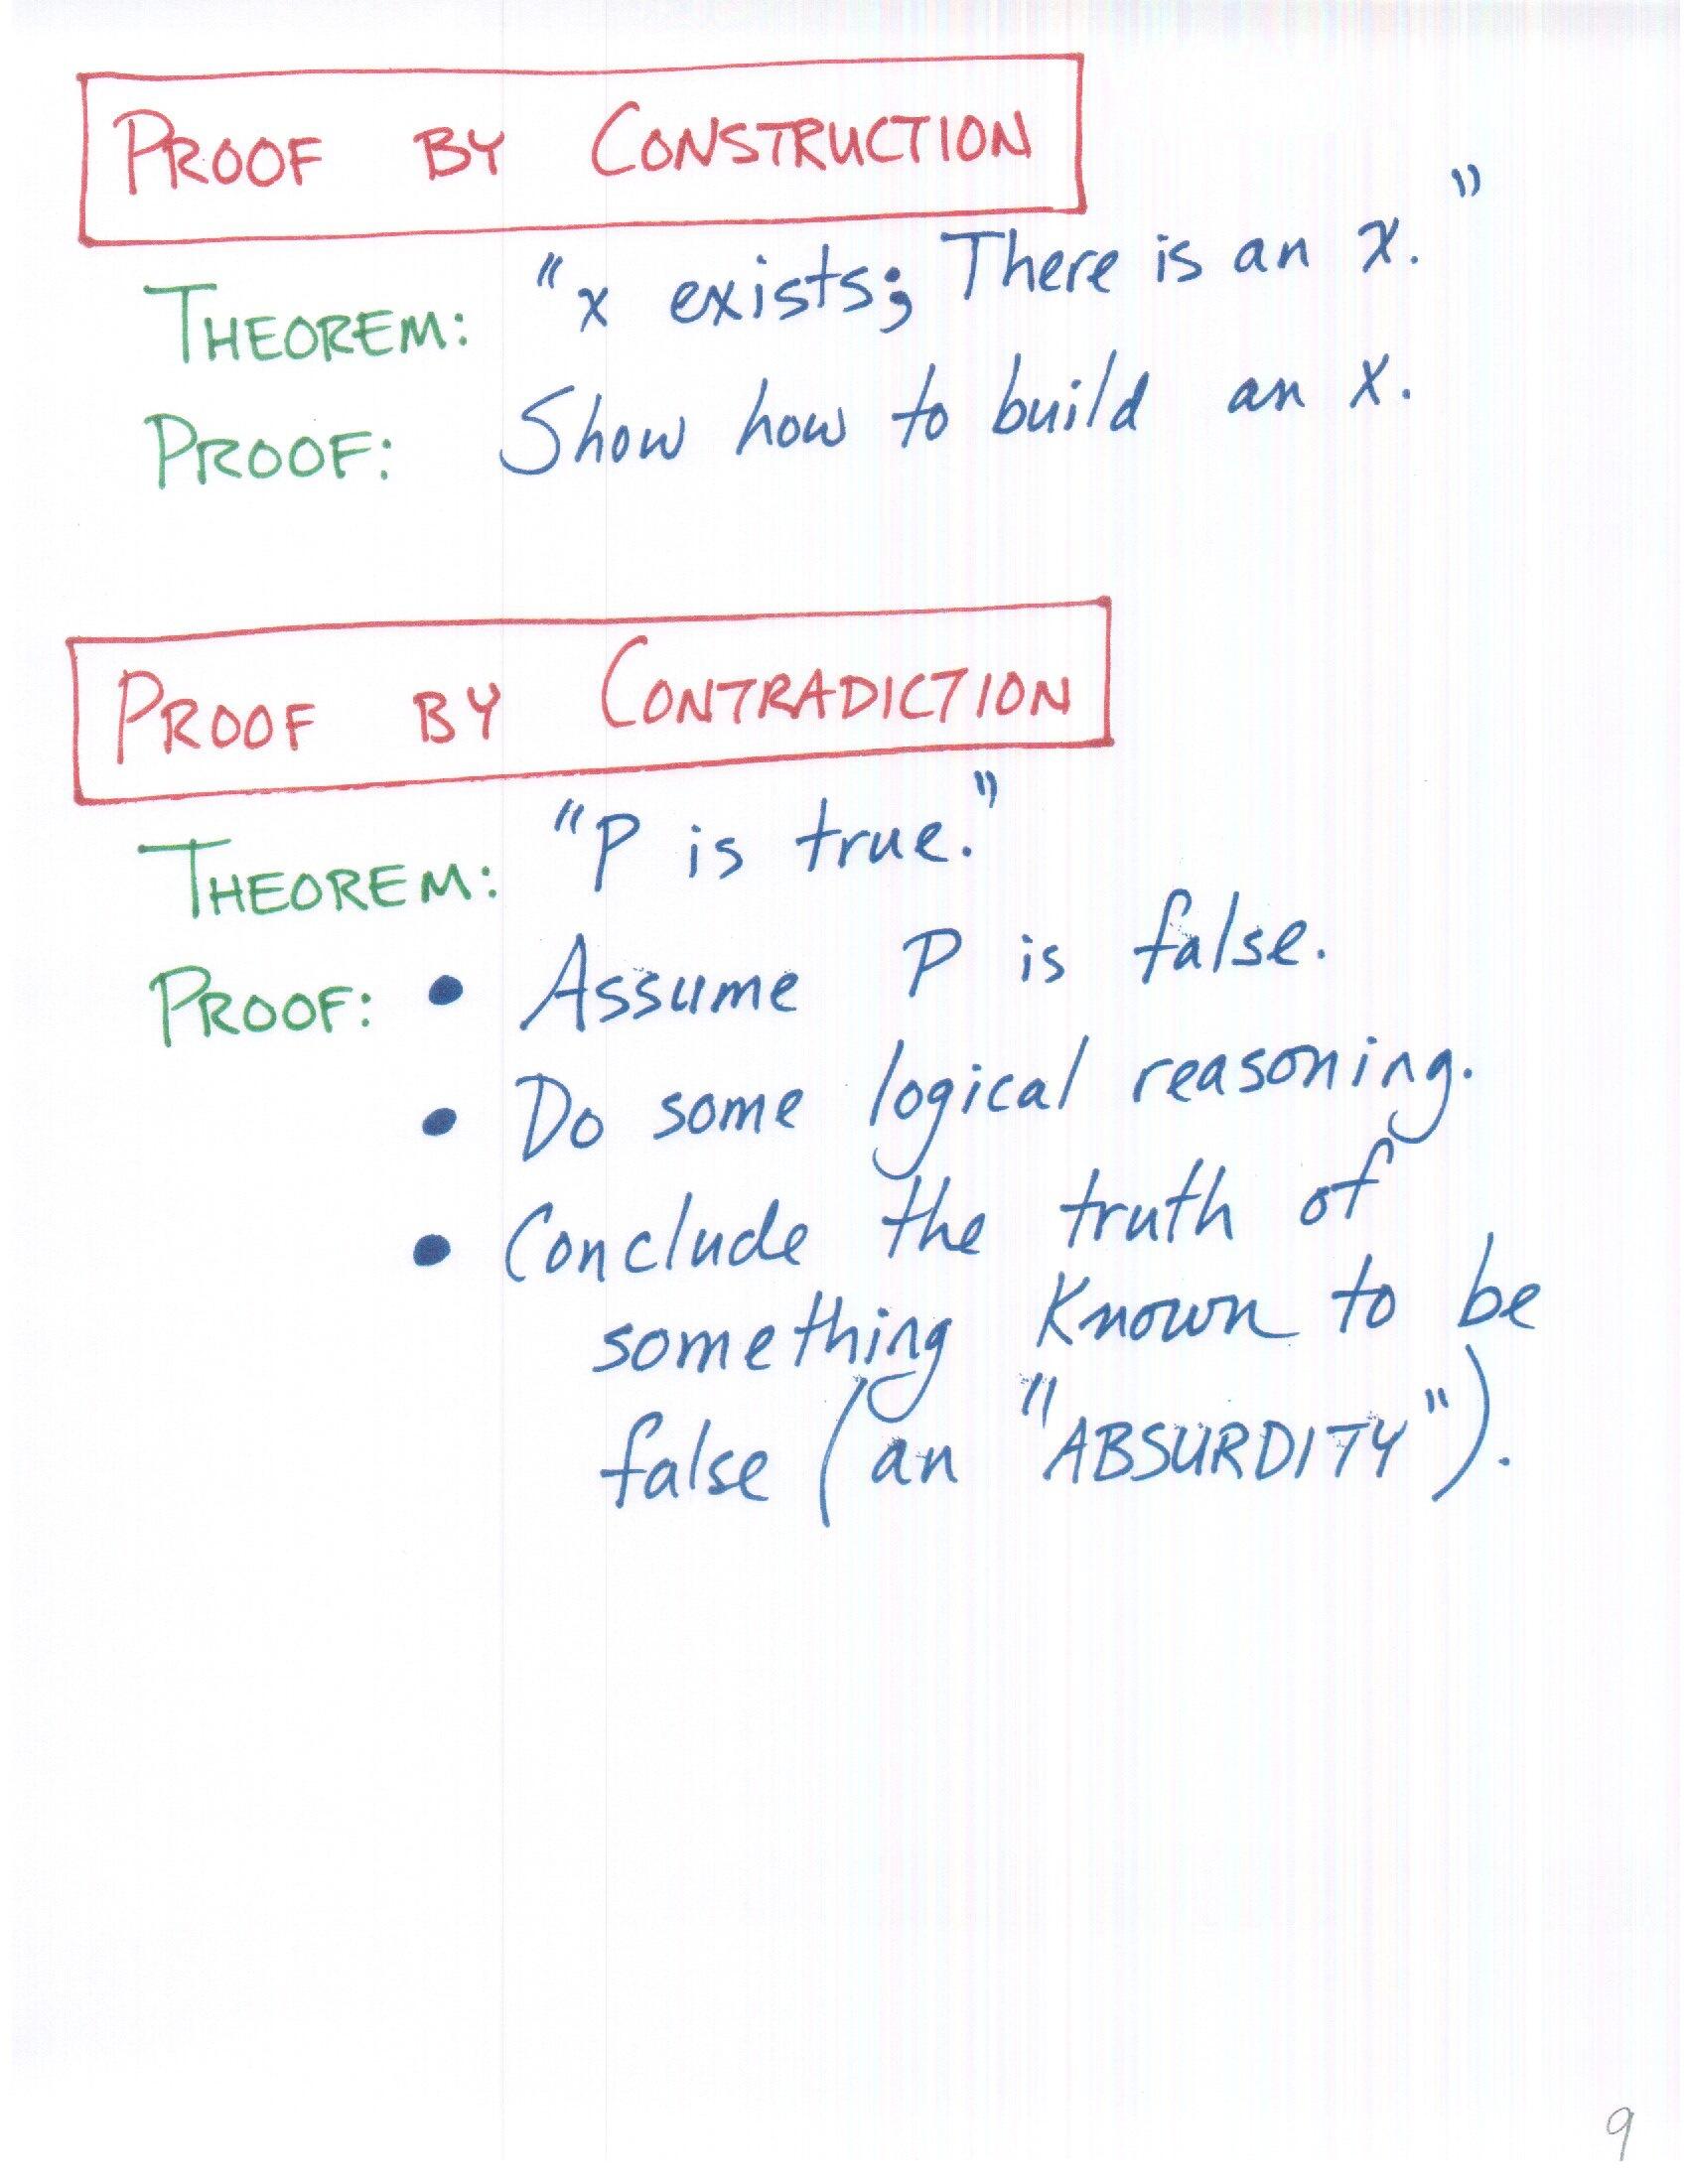 http://web.cecs.pdx.edu/~harry/TheoryOfComp/slides/chapter0/slide%208.jpeg